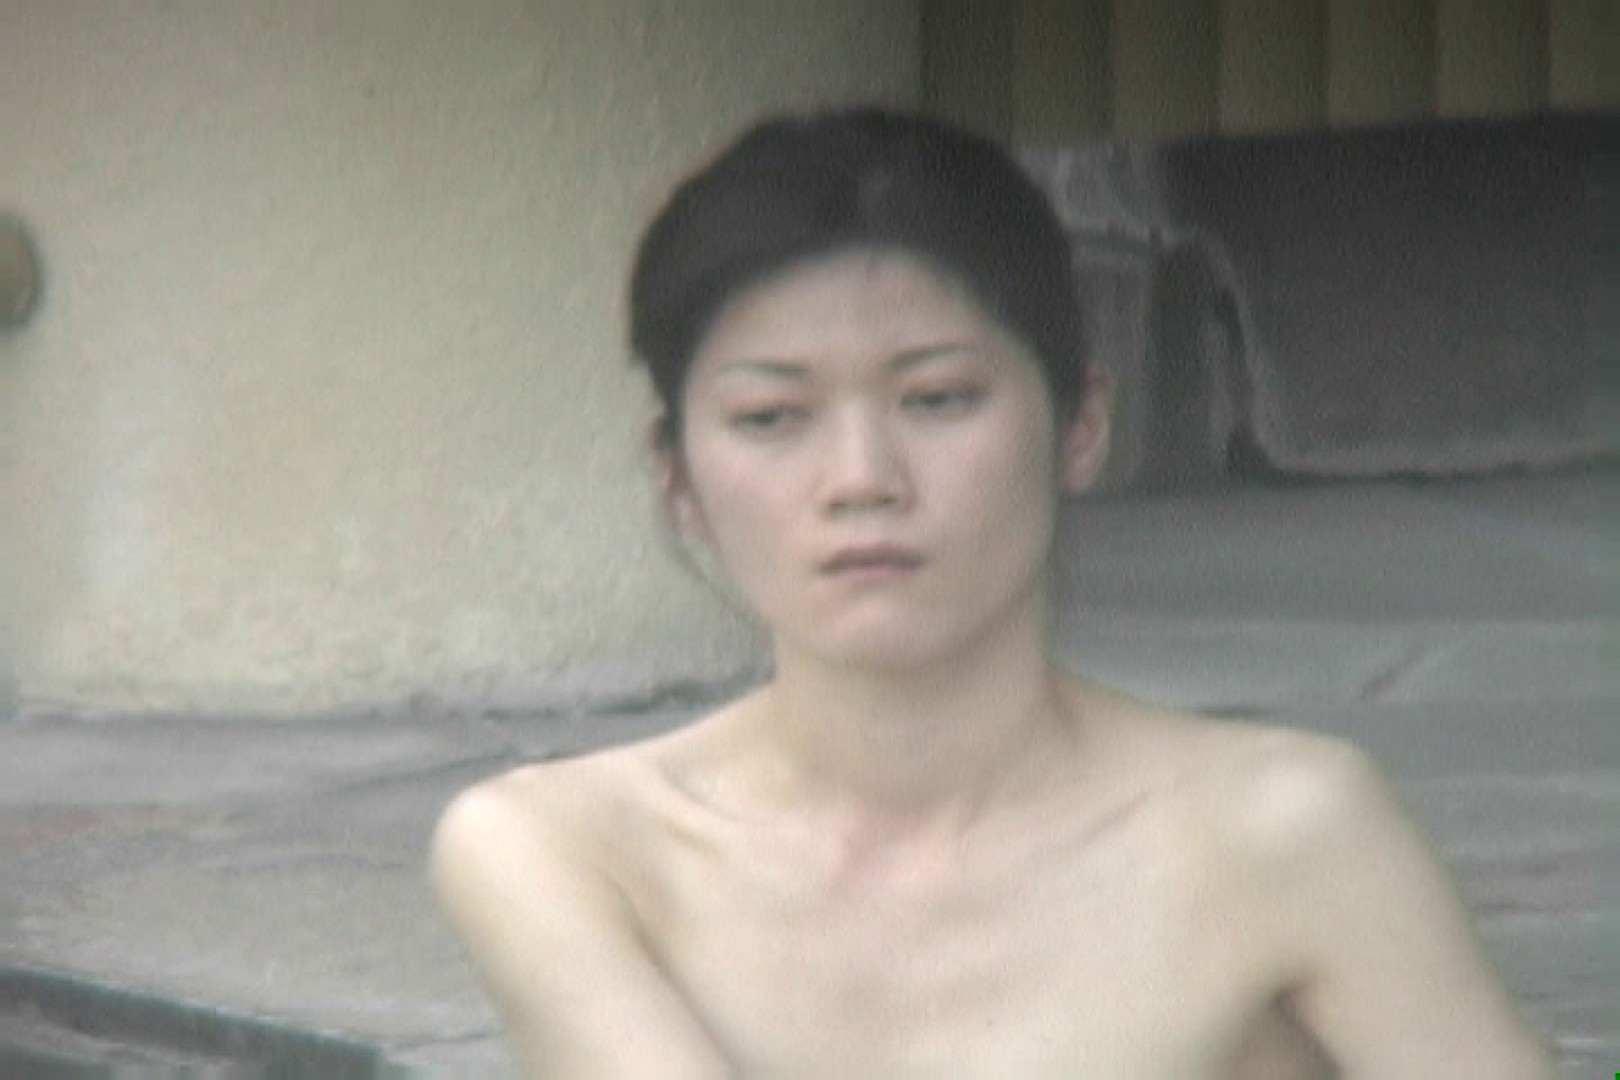 Aquaな露天風呂Vol.686 HなOL のぞき動画キャプチャ 83pic 7